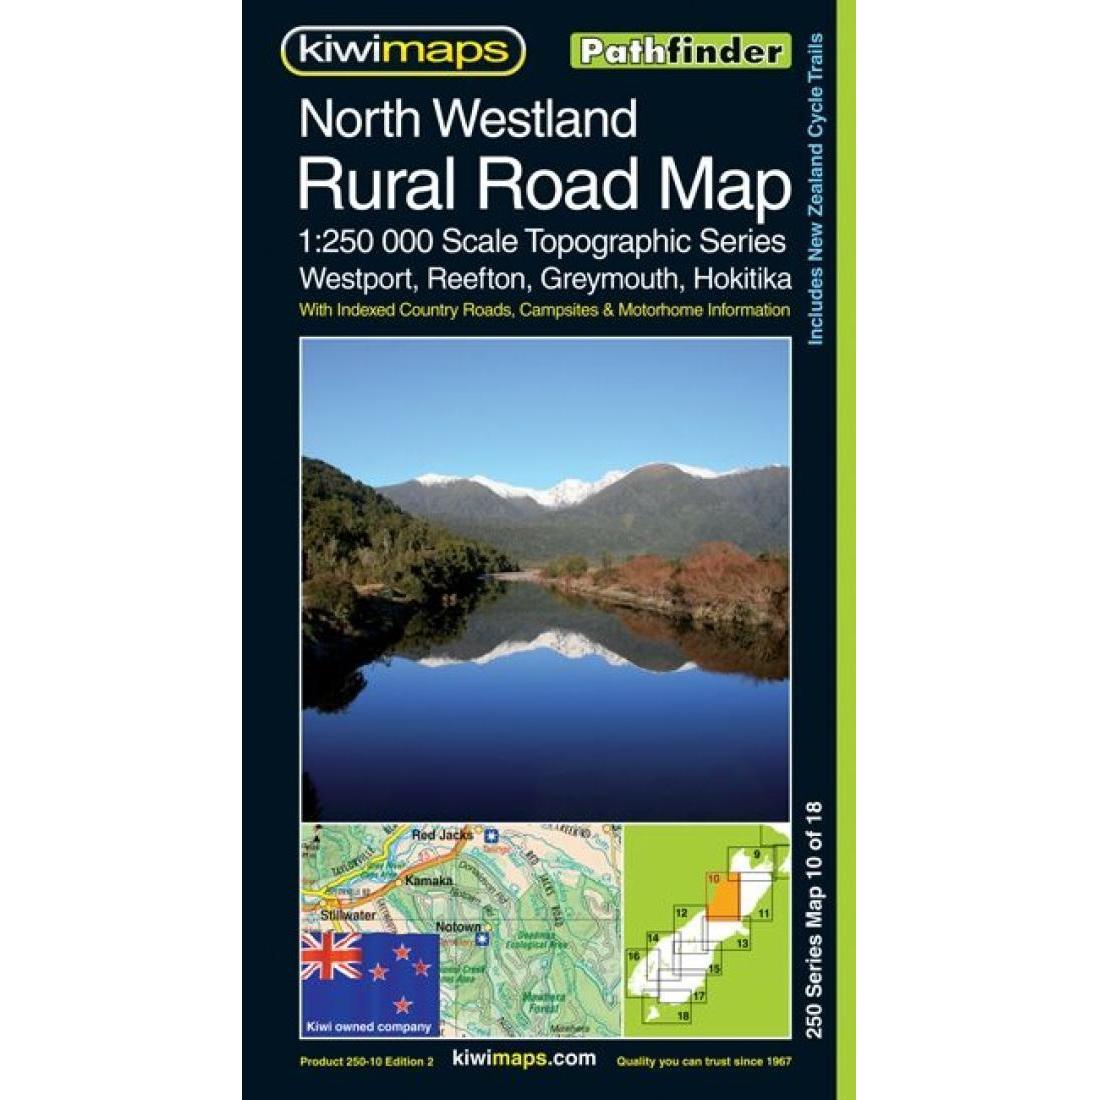 North Westland Rural Road Map